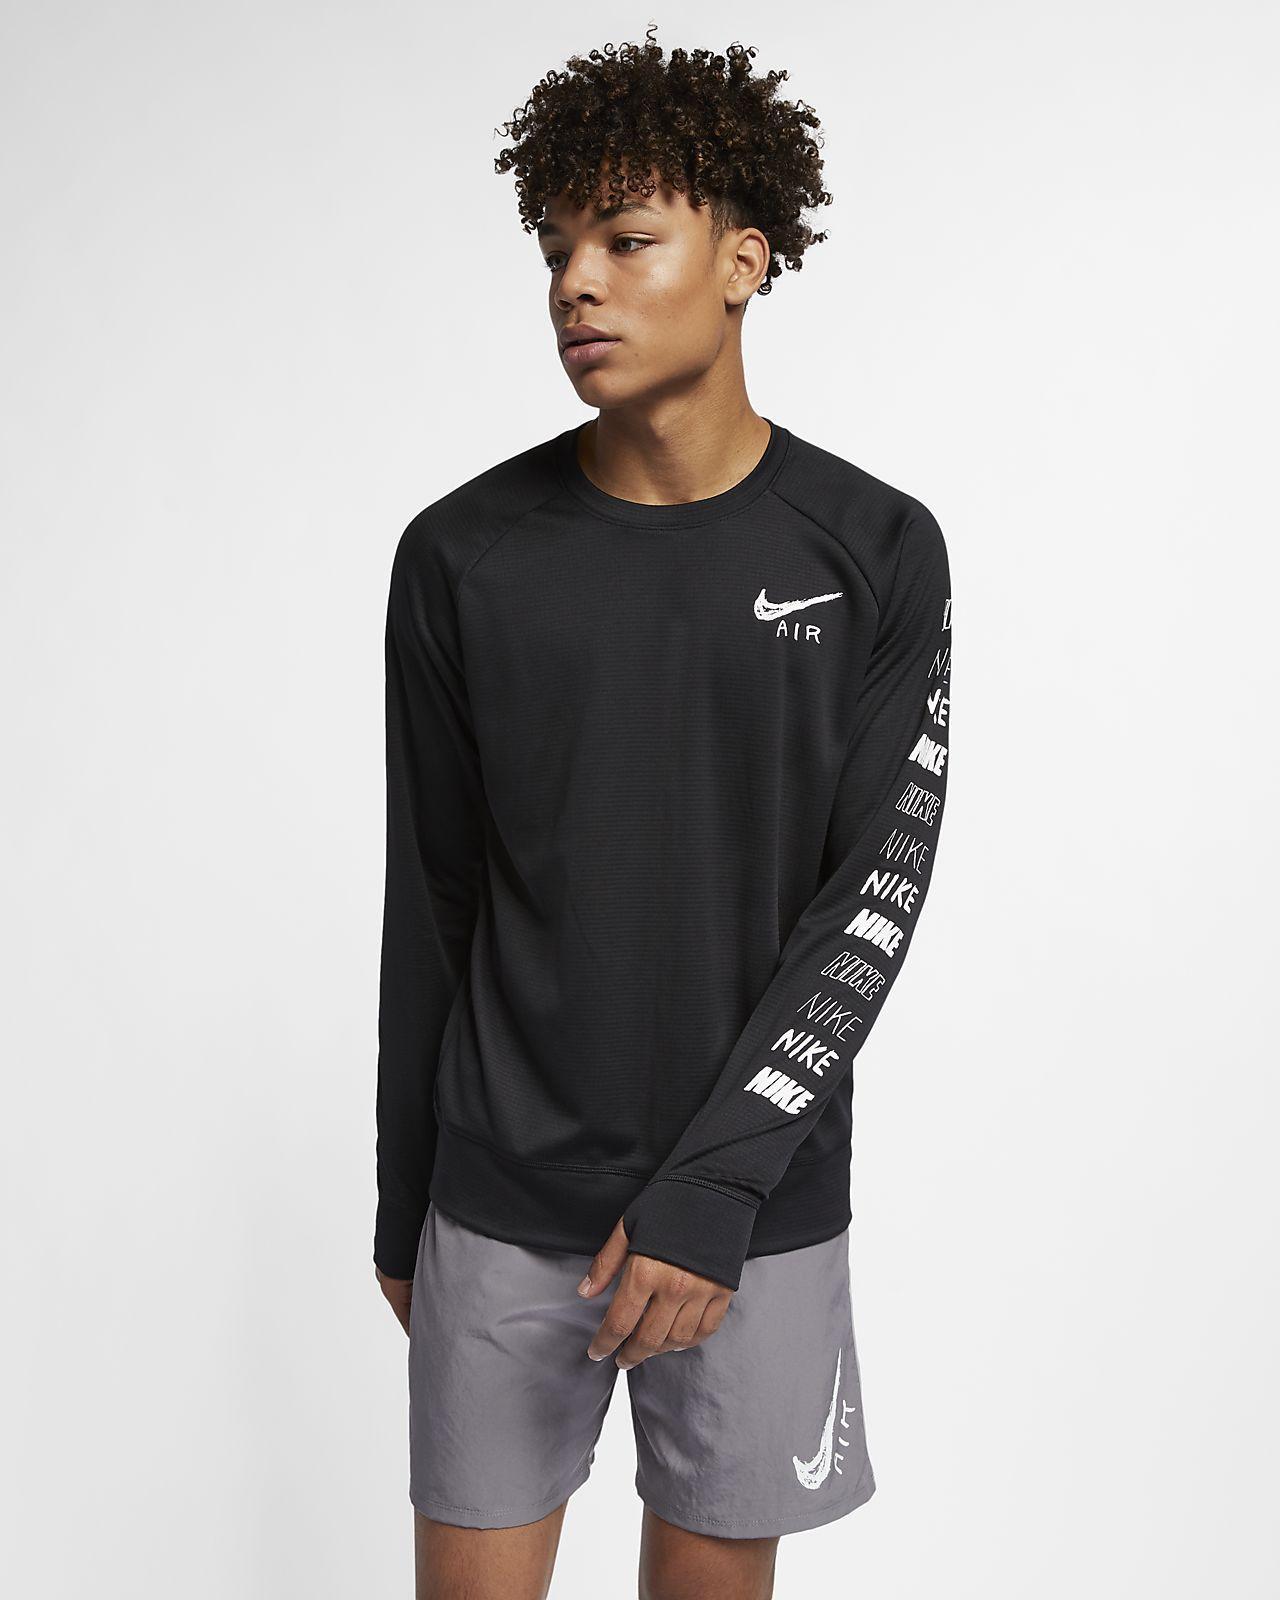 Męska koszulka do biegania Nike Pacer